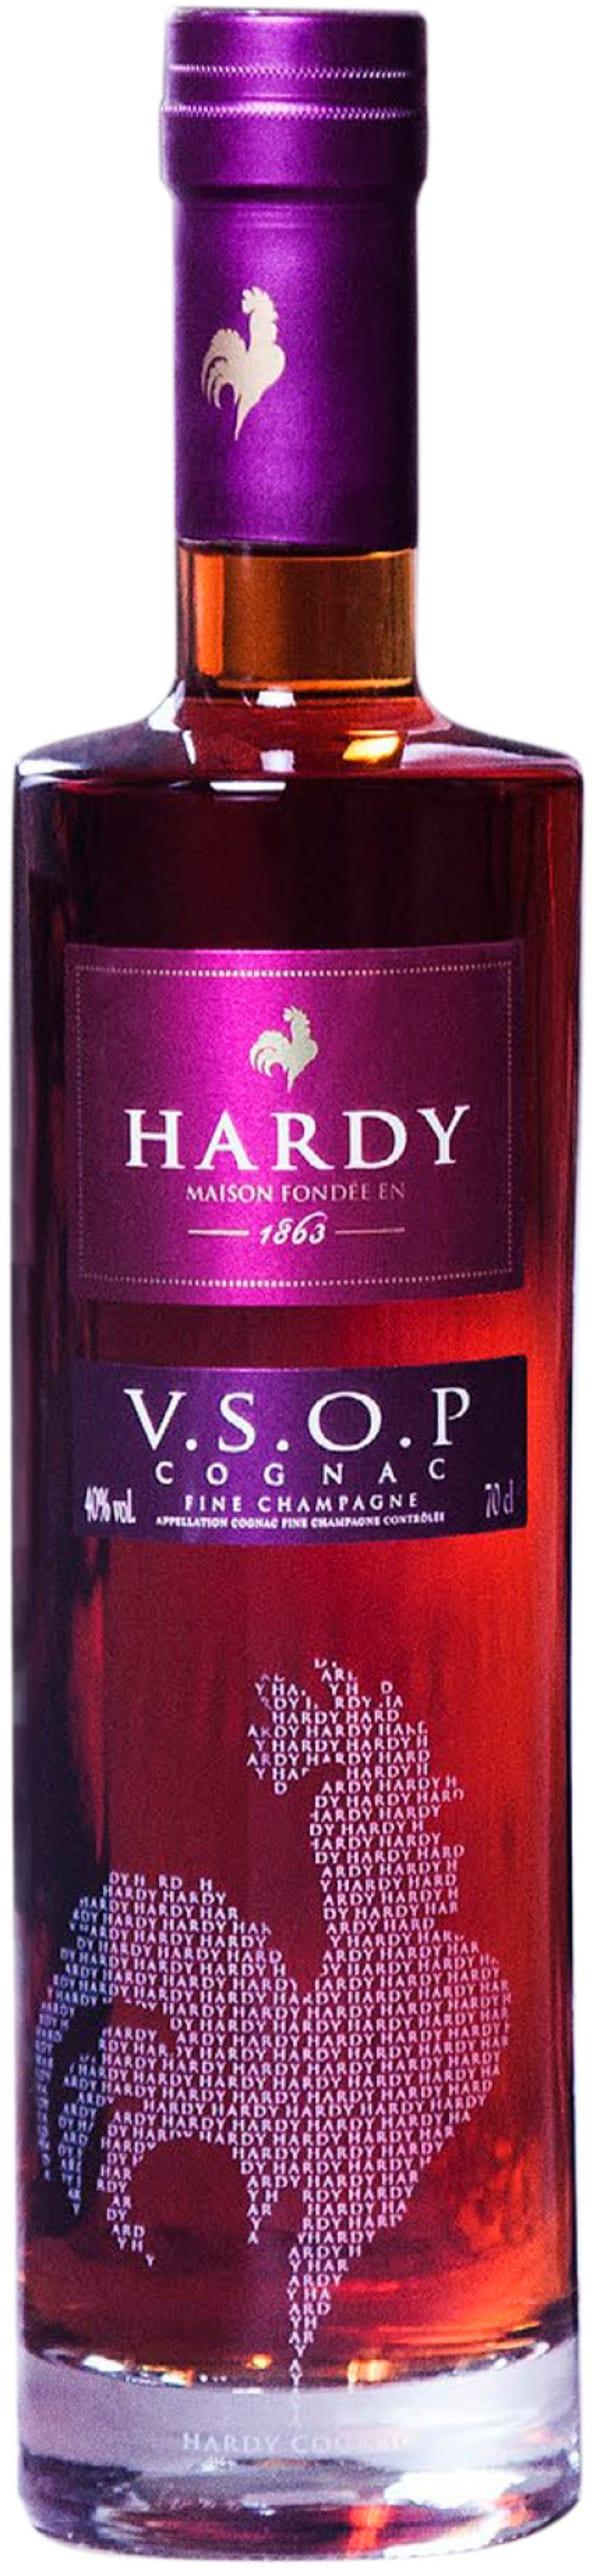 Hardy Fine Champagne VSOP